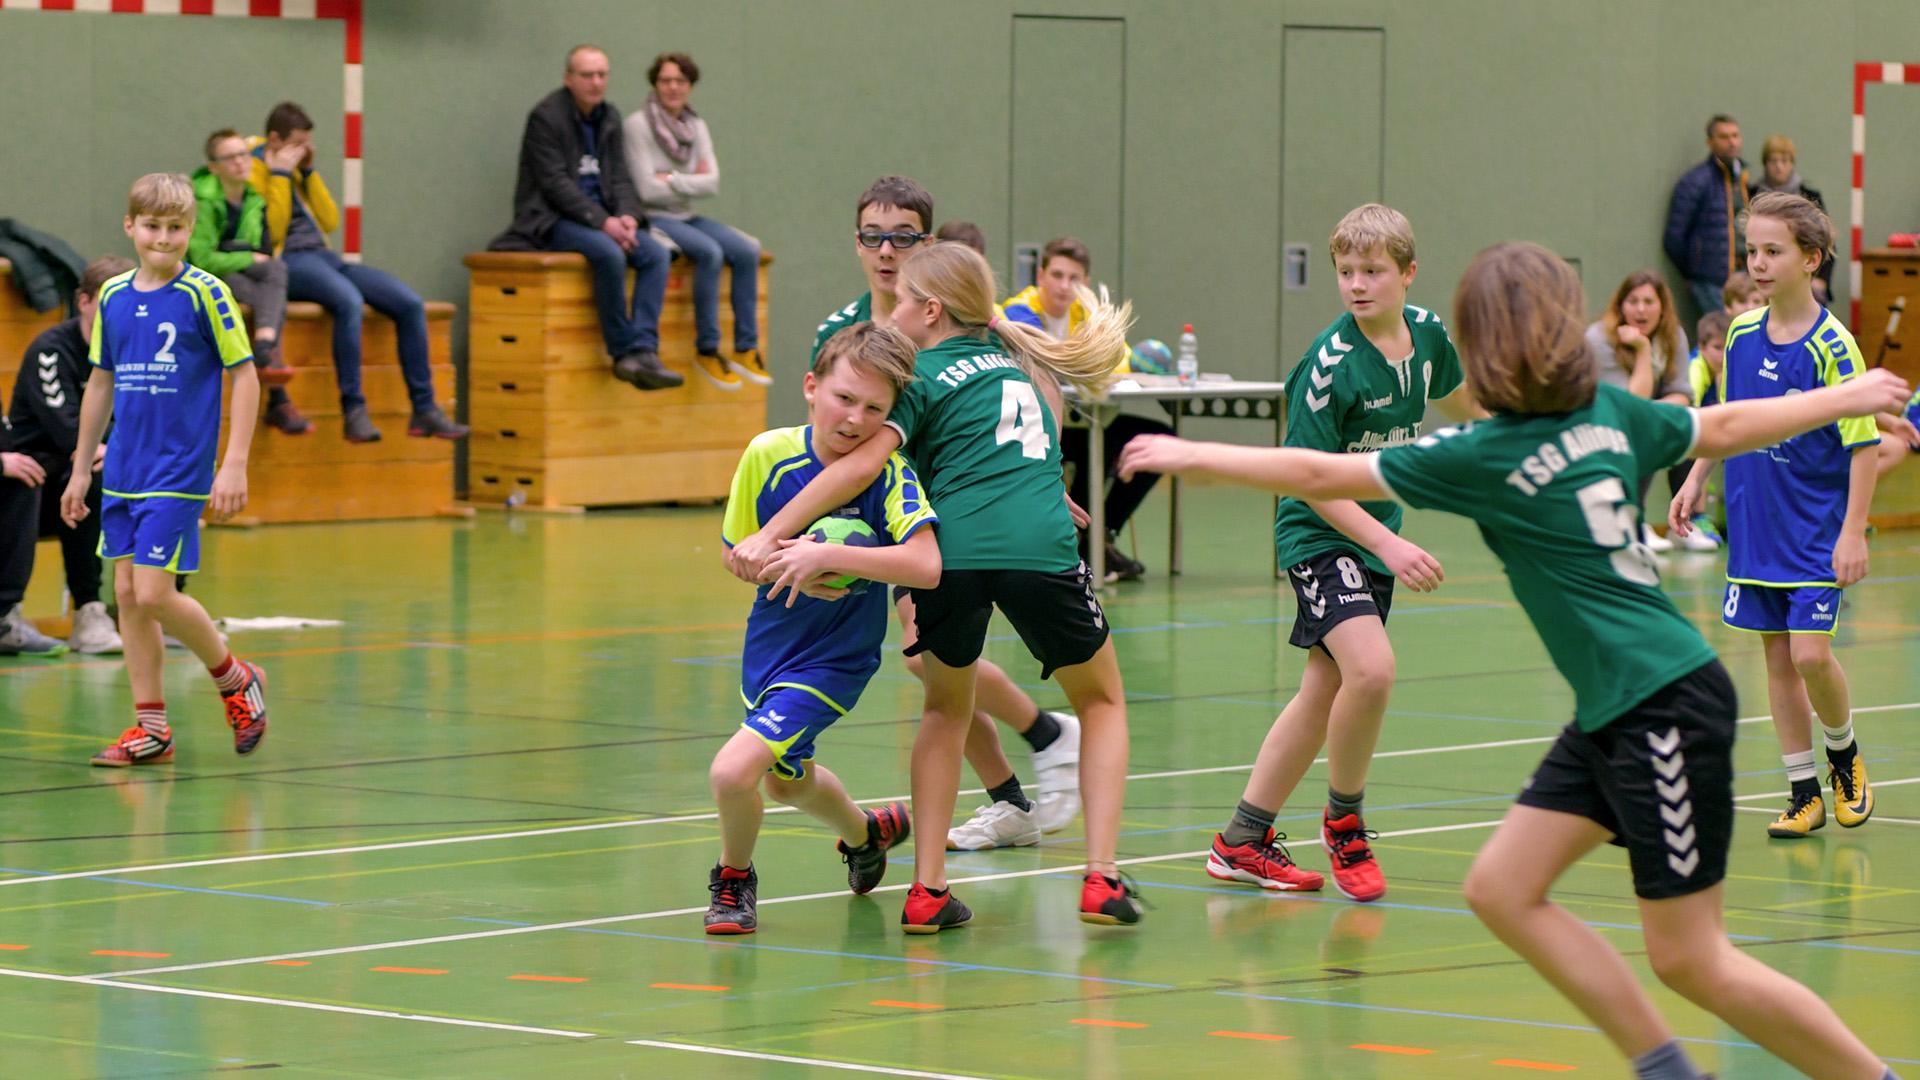 019Slider_mD_tsg_leutkirch_handball